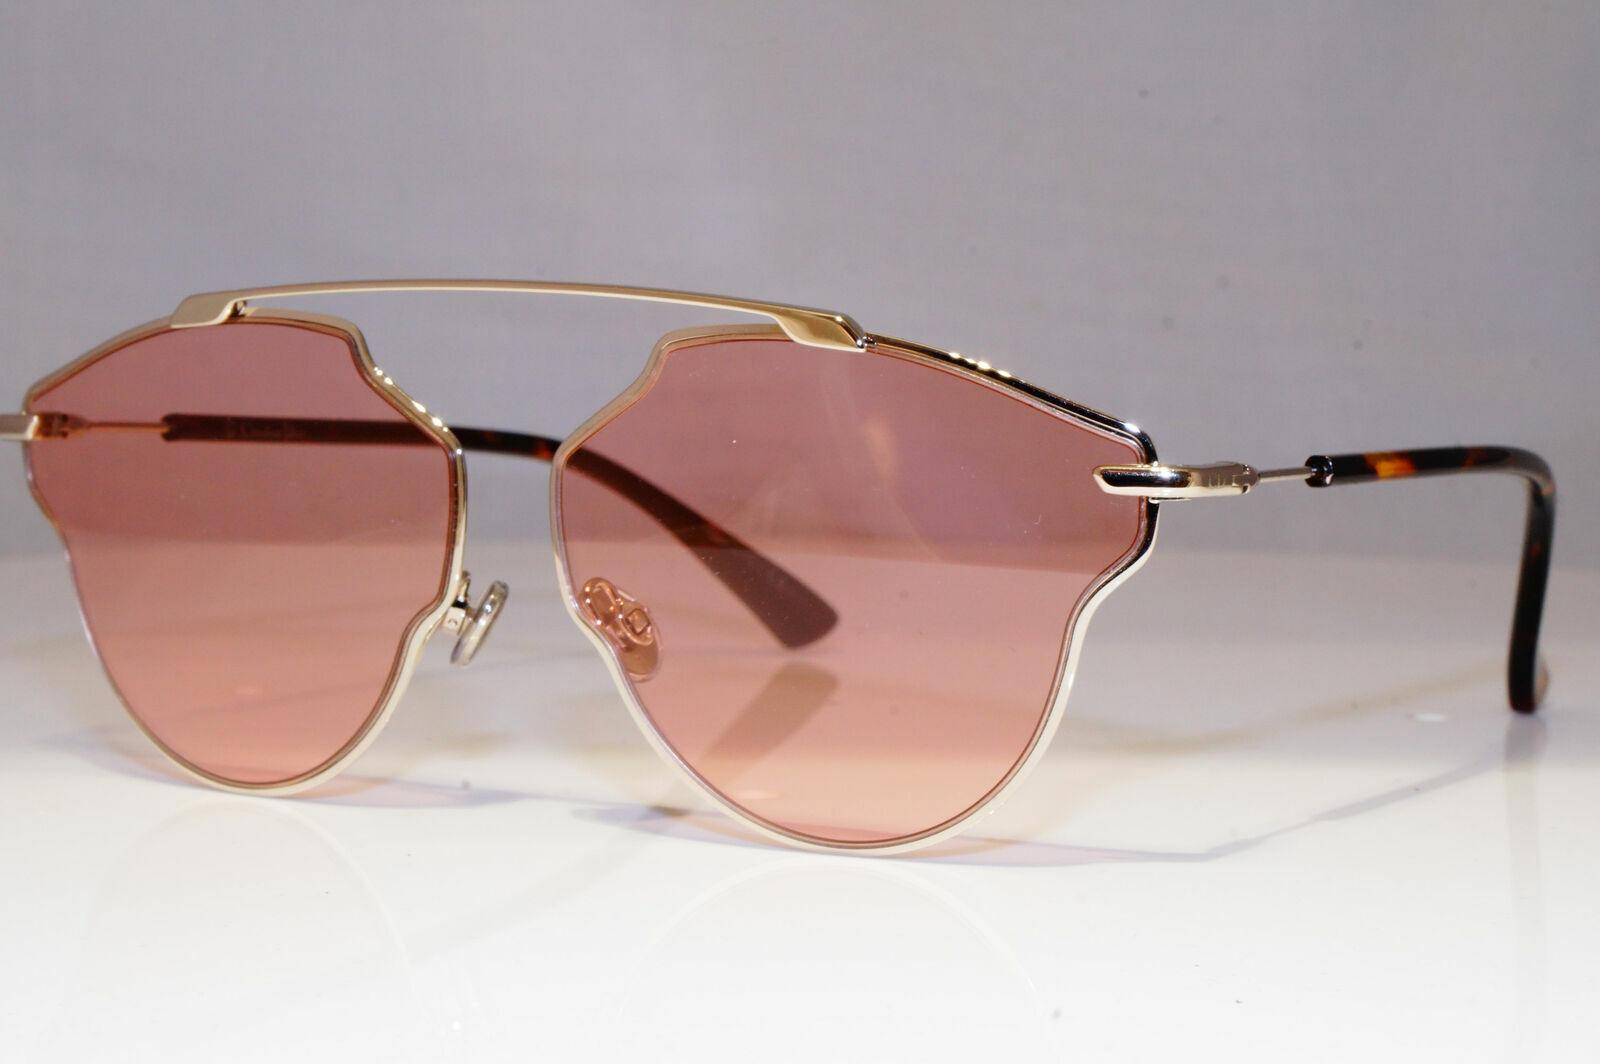 Authentic DIOR Womens Sunglasses Silver Square PERFECT So Real Pop 25620